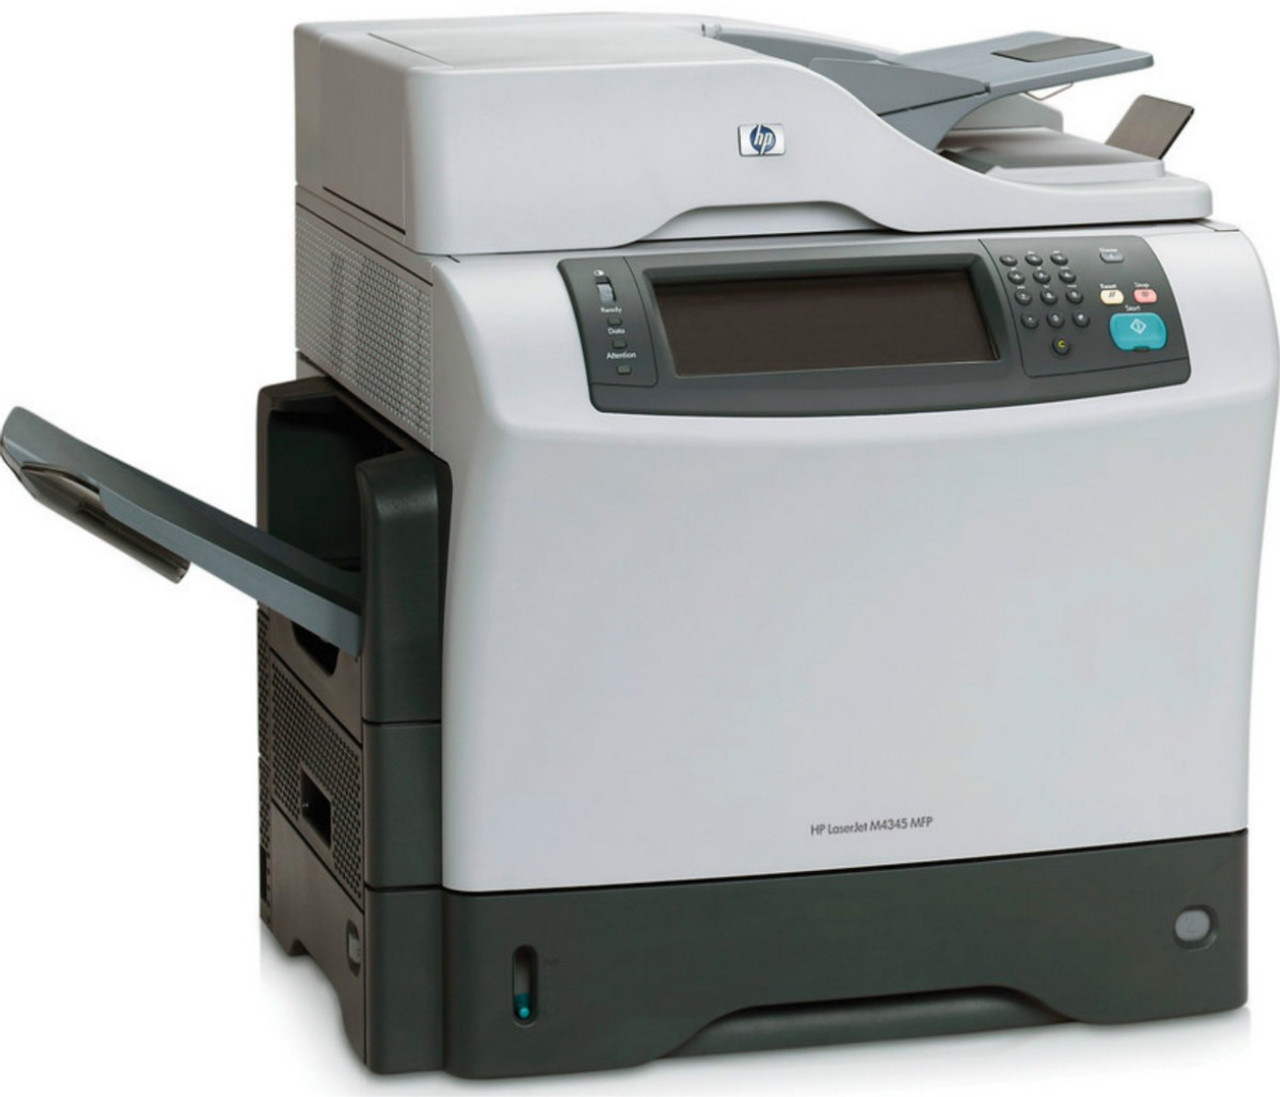 HP LaserJet 4345mfp - Q3942A#ABA - HP Multifunction Laser Printer for sale